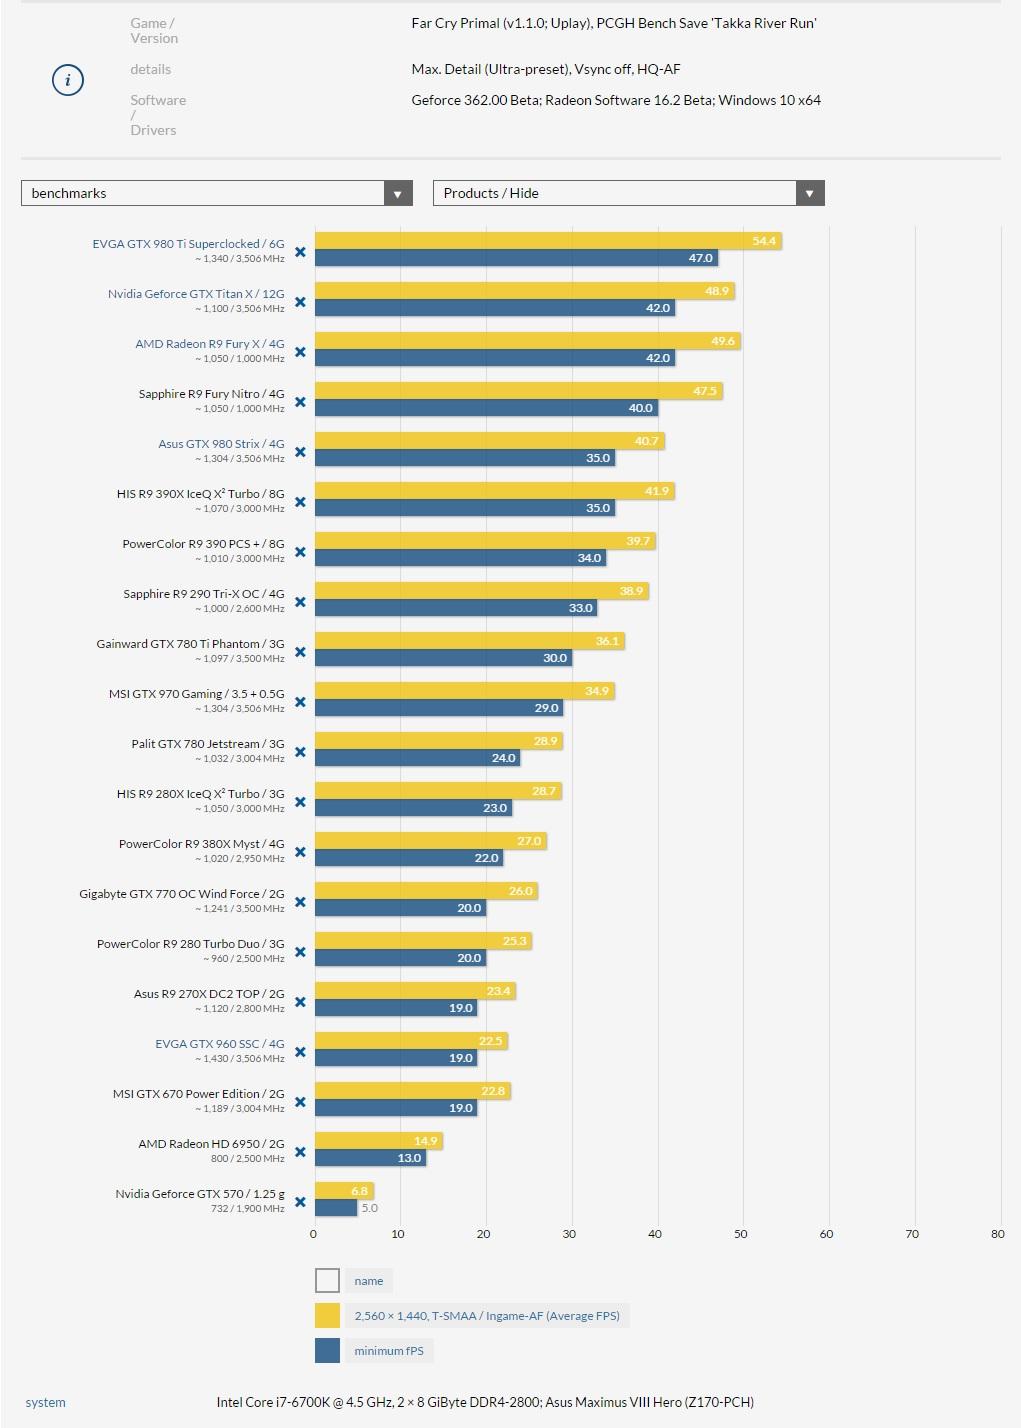 nvidia-amd-far-cry-primal-pc-benchmarks-2560x1440-pcgameshardware